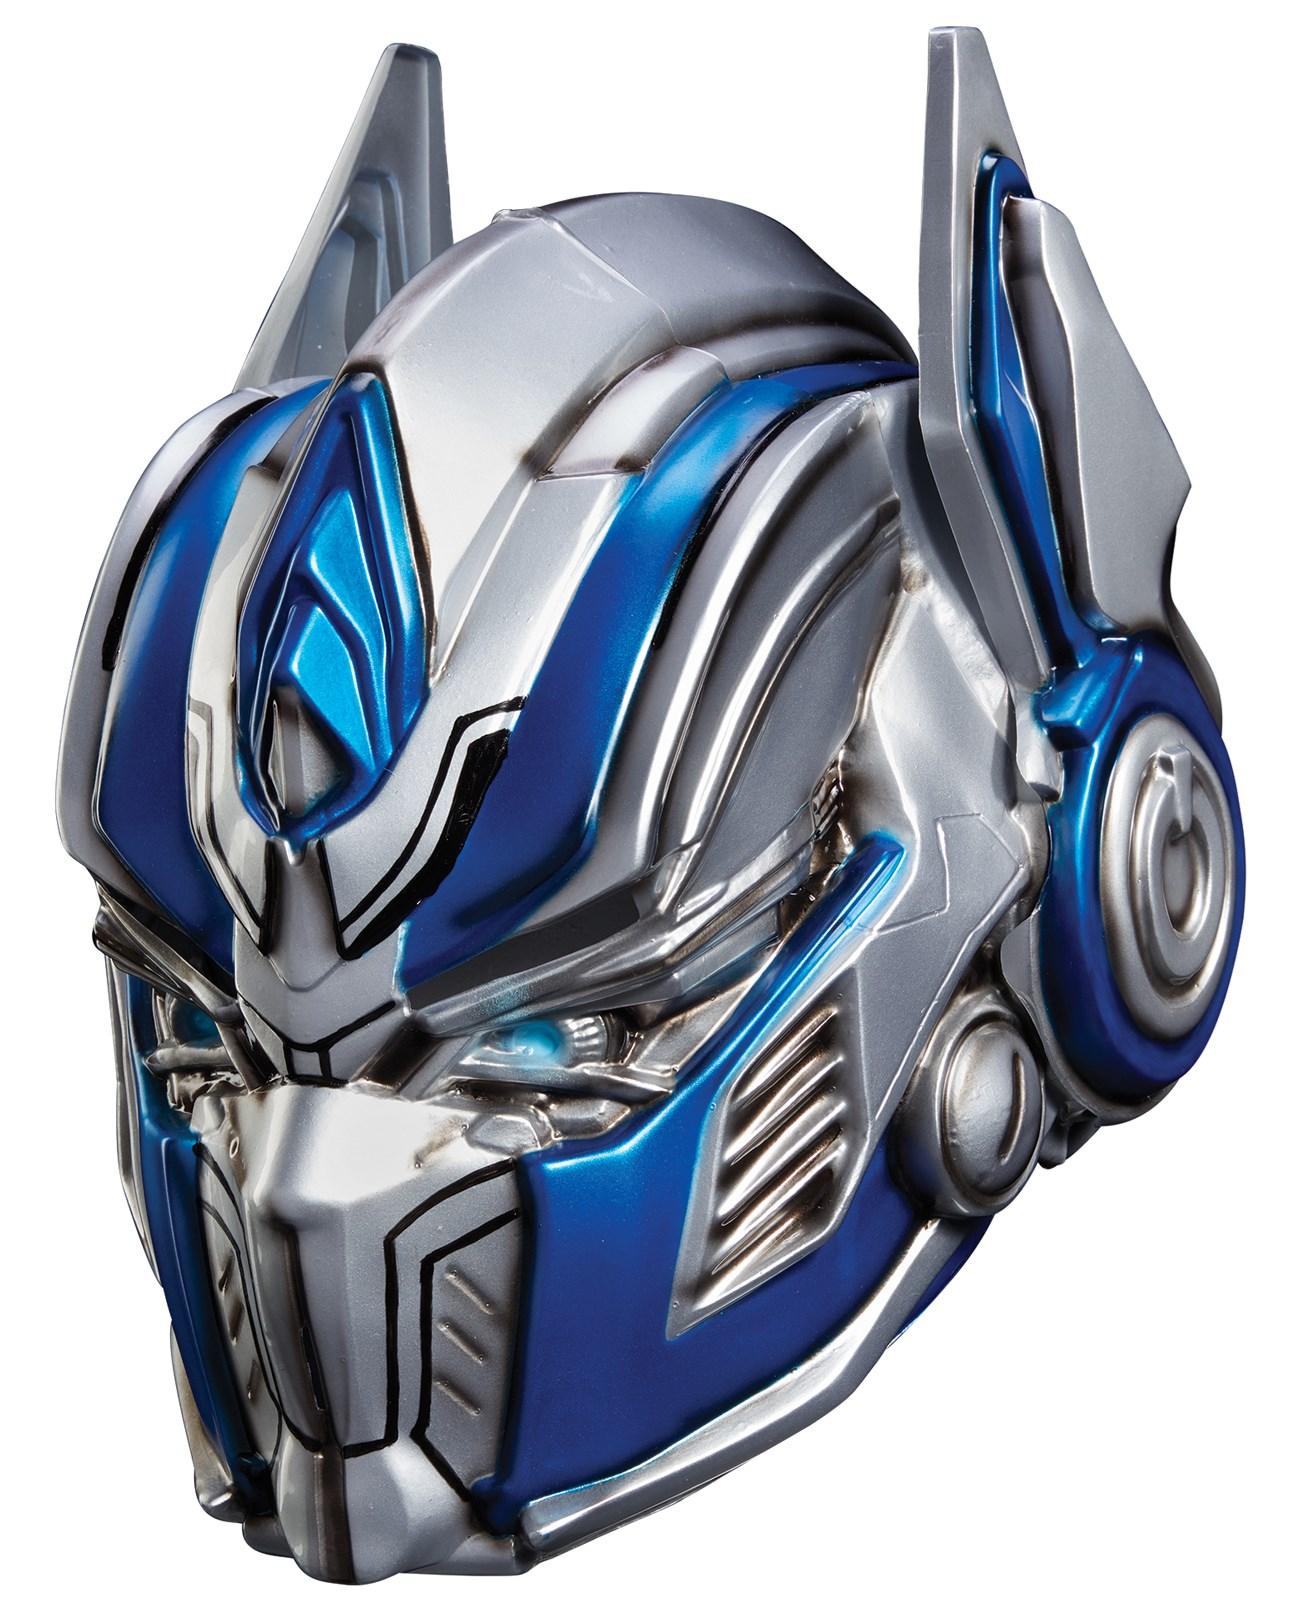 Transformers The Last Knight Optimus Prime Helmet Autos Post